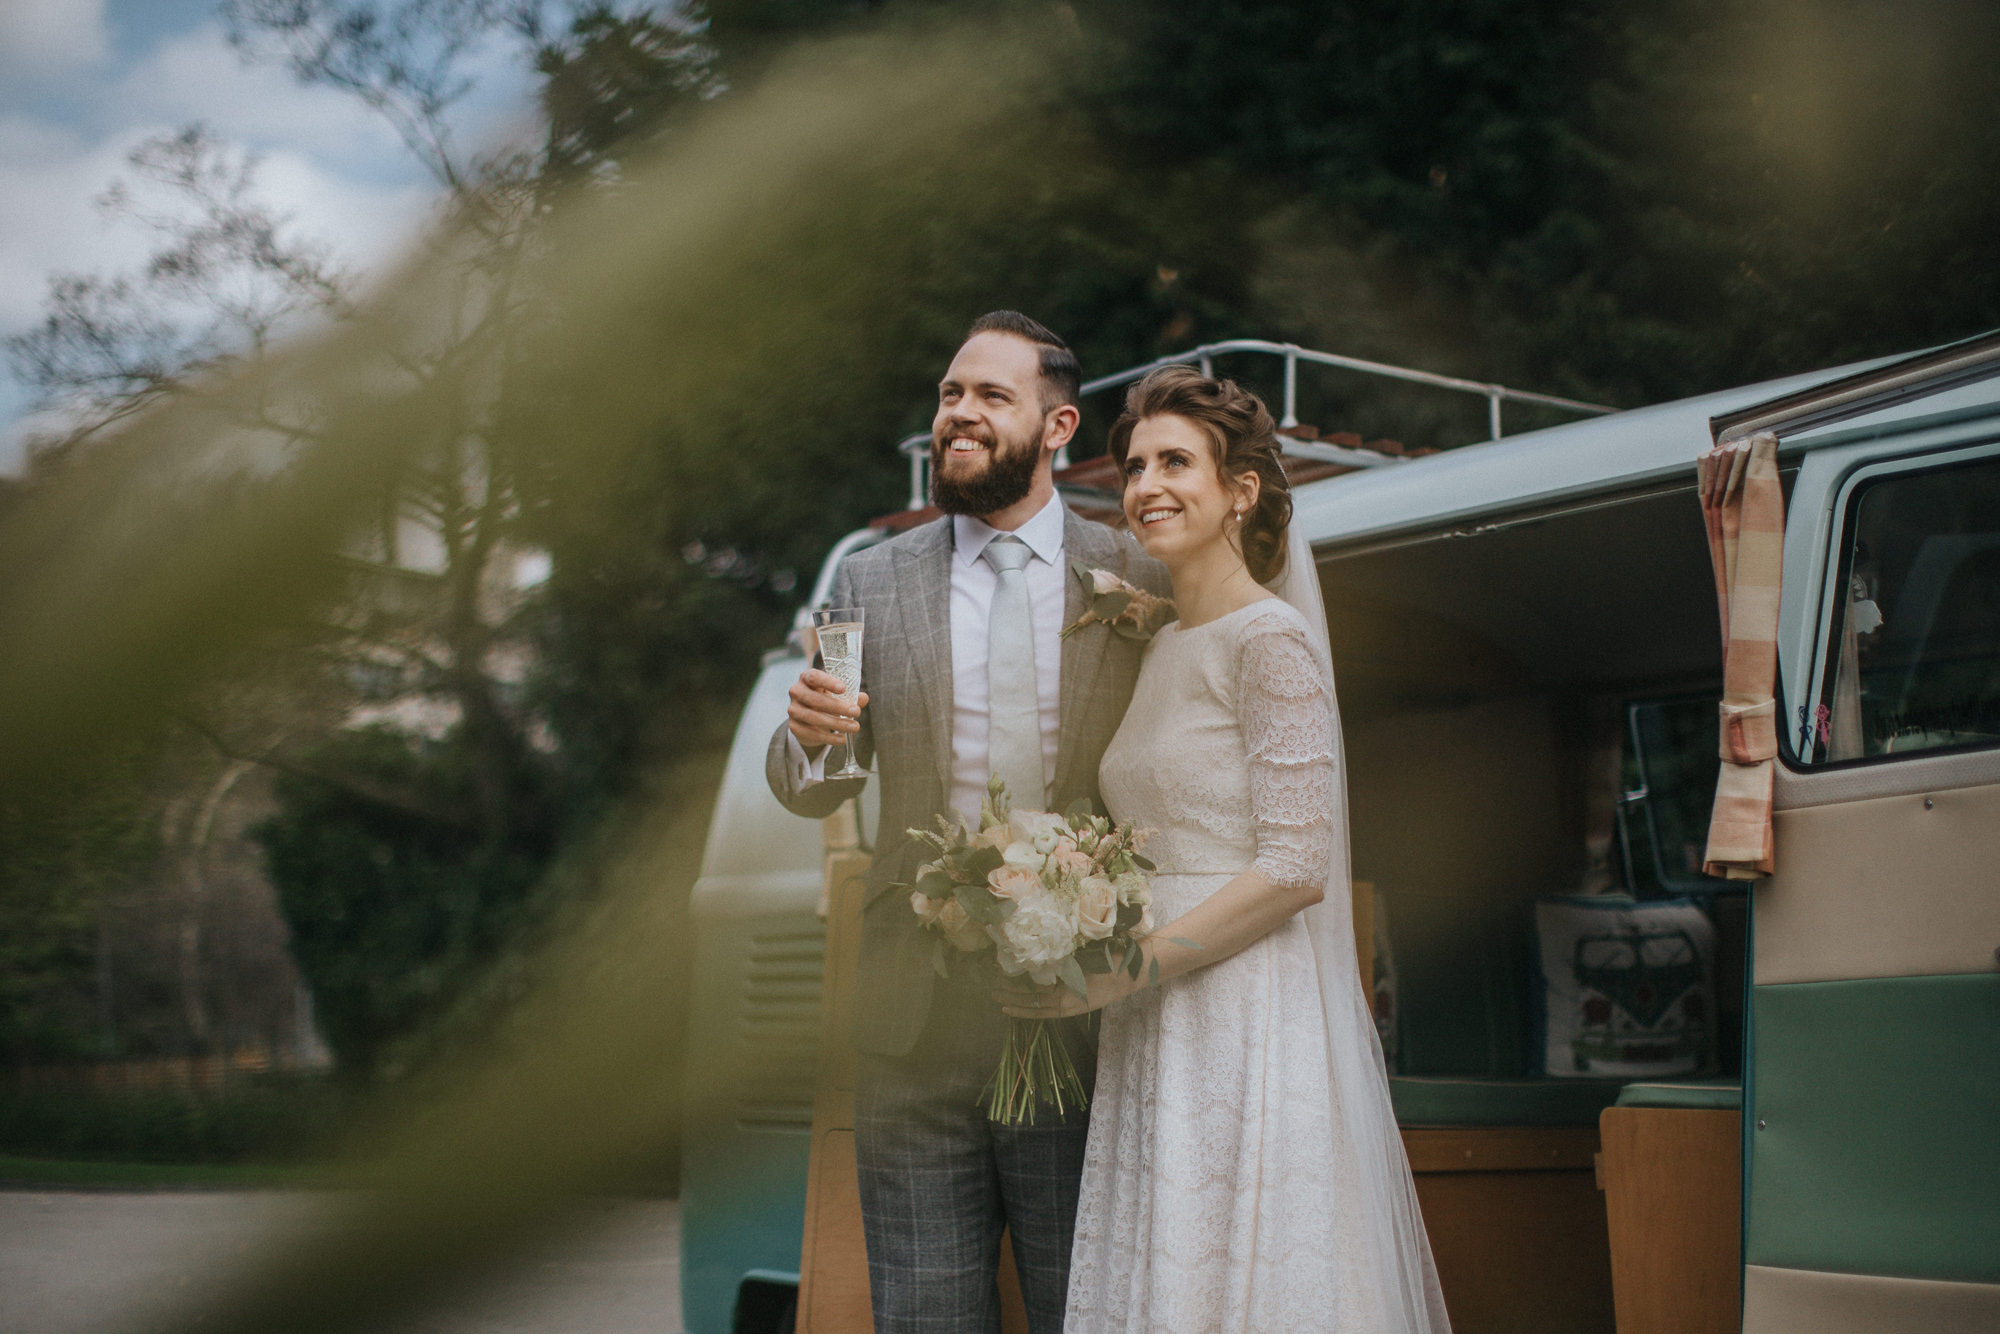 Kate-Beaumont-Lace-Flared-Dahlia-Gown-Leeds-Wedding-Bloom-Weddings-44.jpg